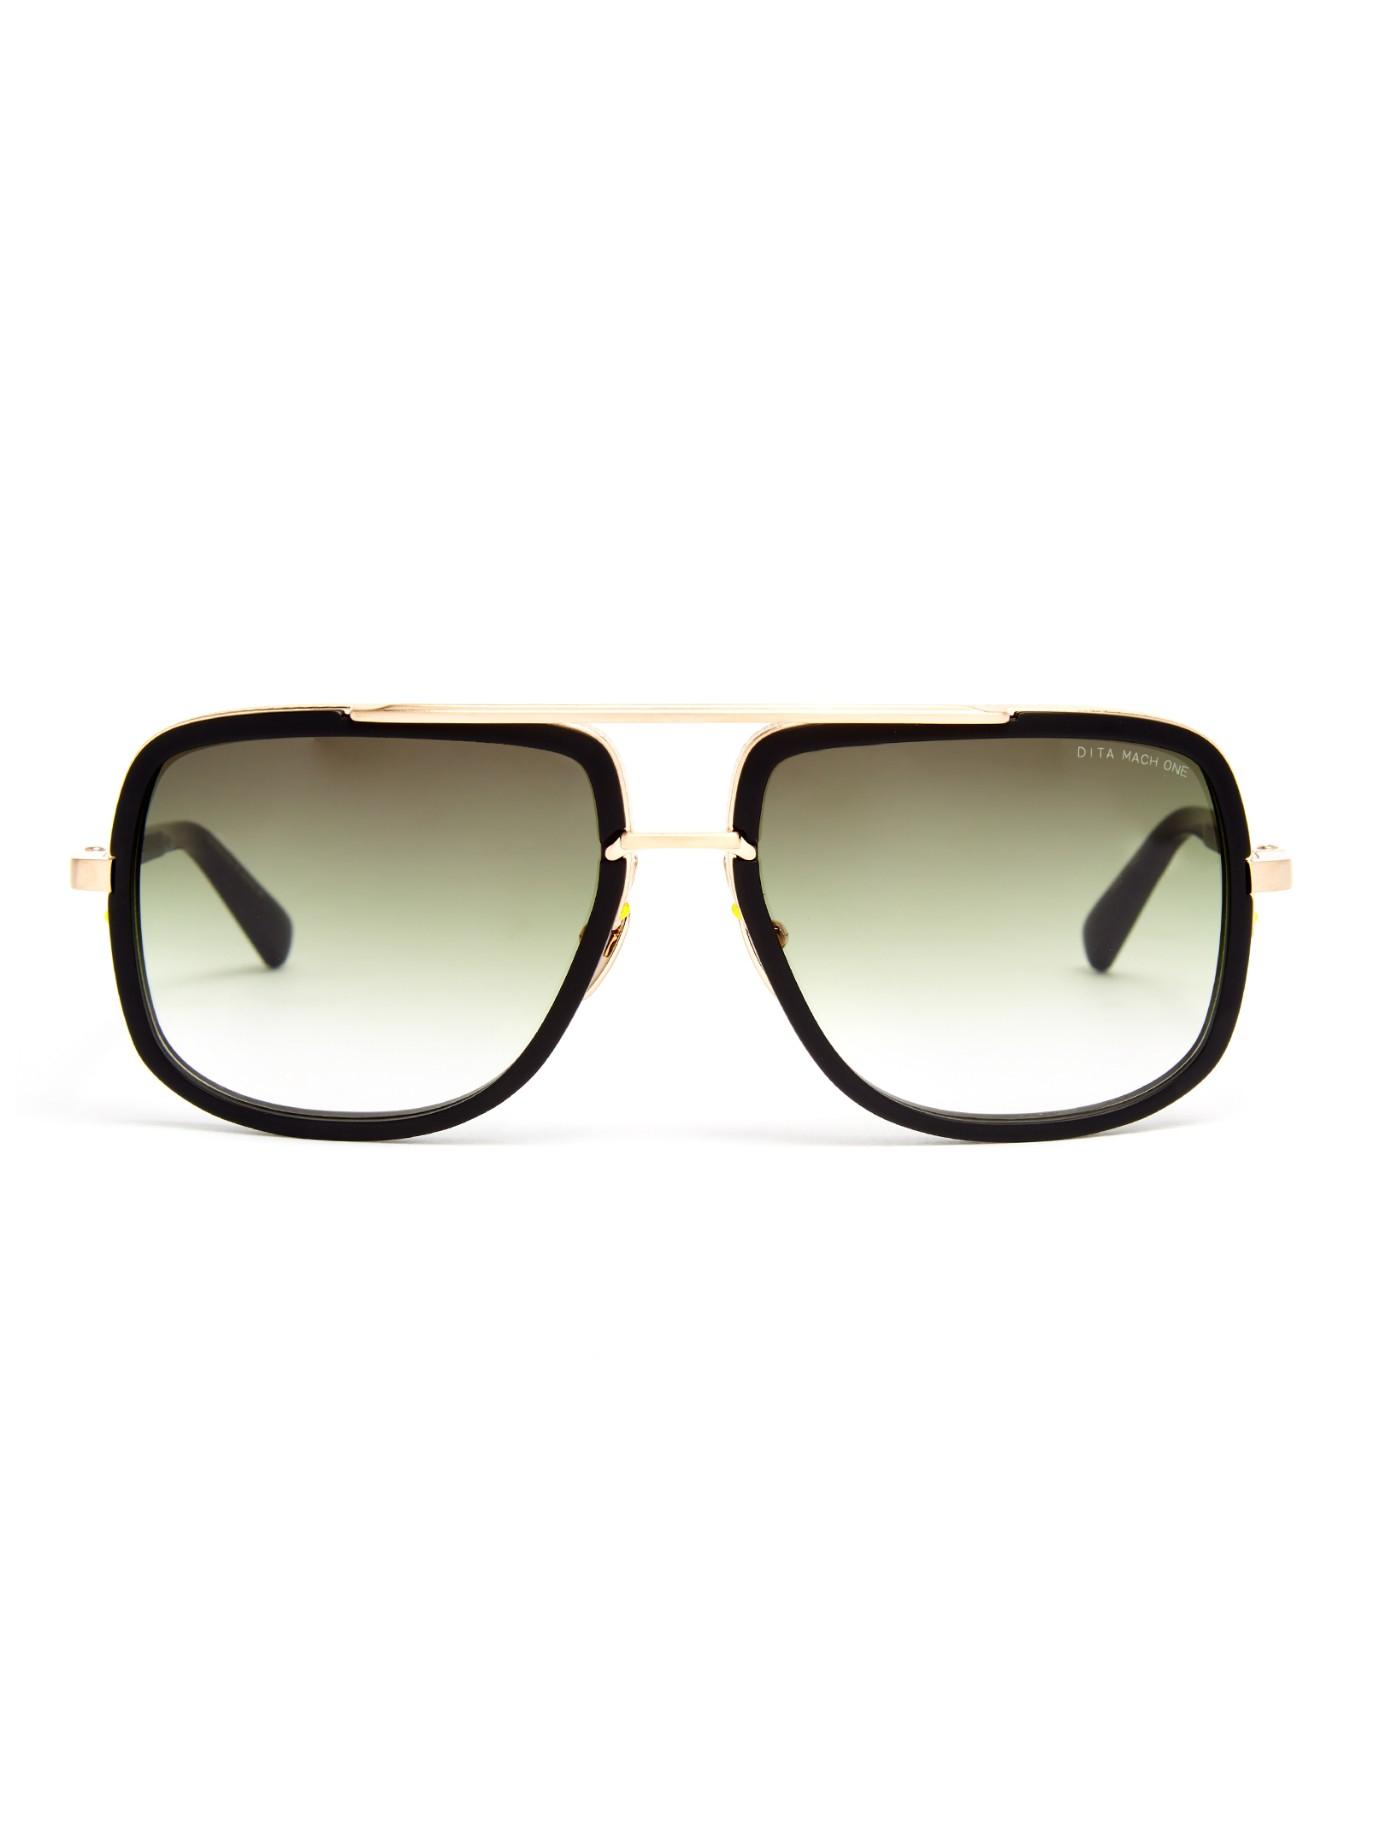 93e91ee819 Dita Mach One Replica Sunglasses